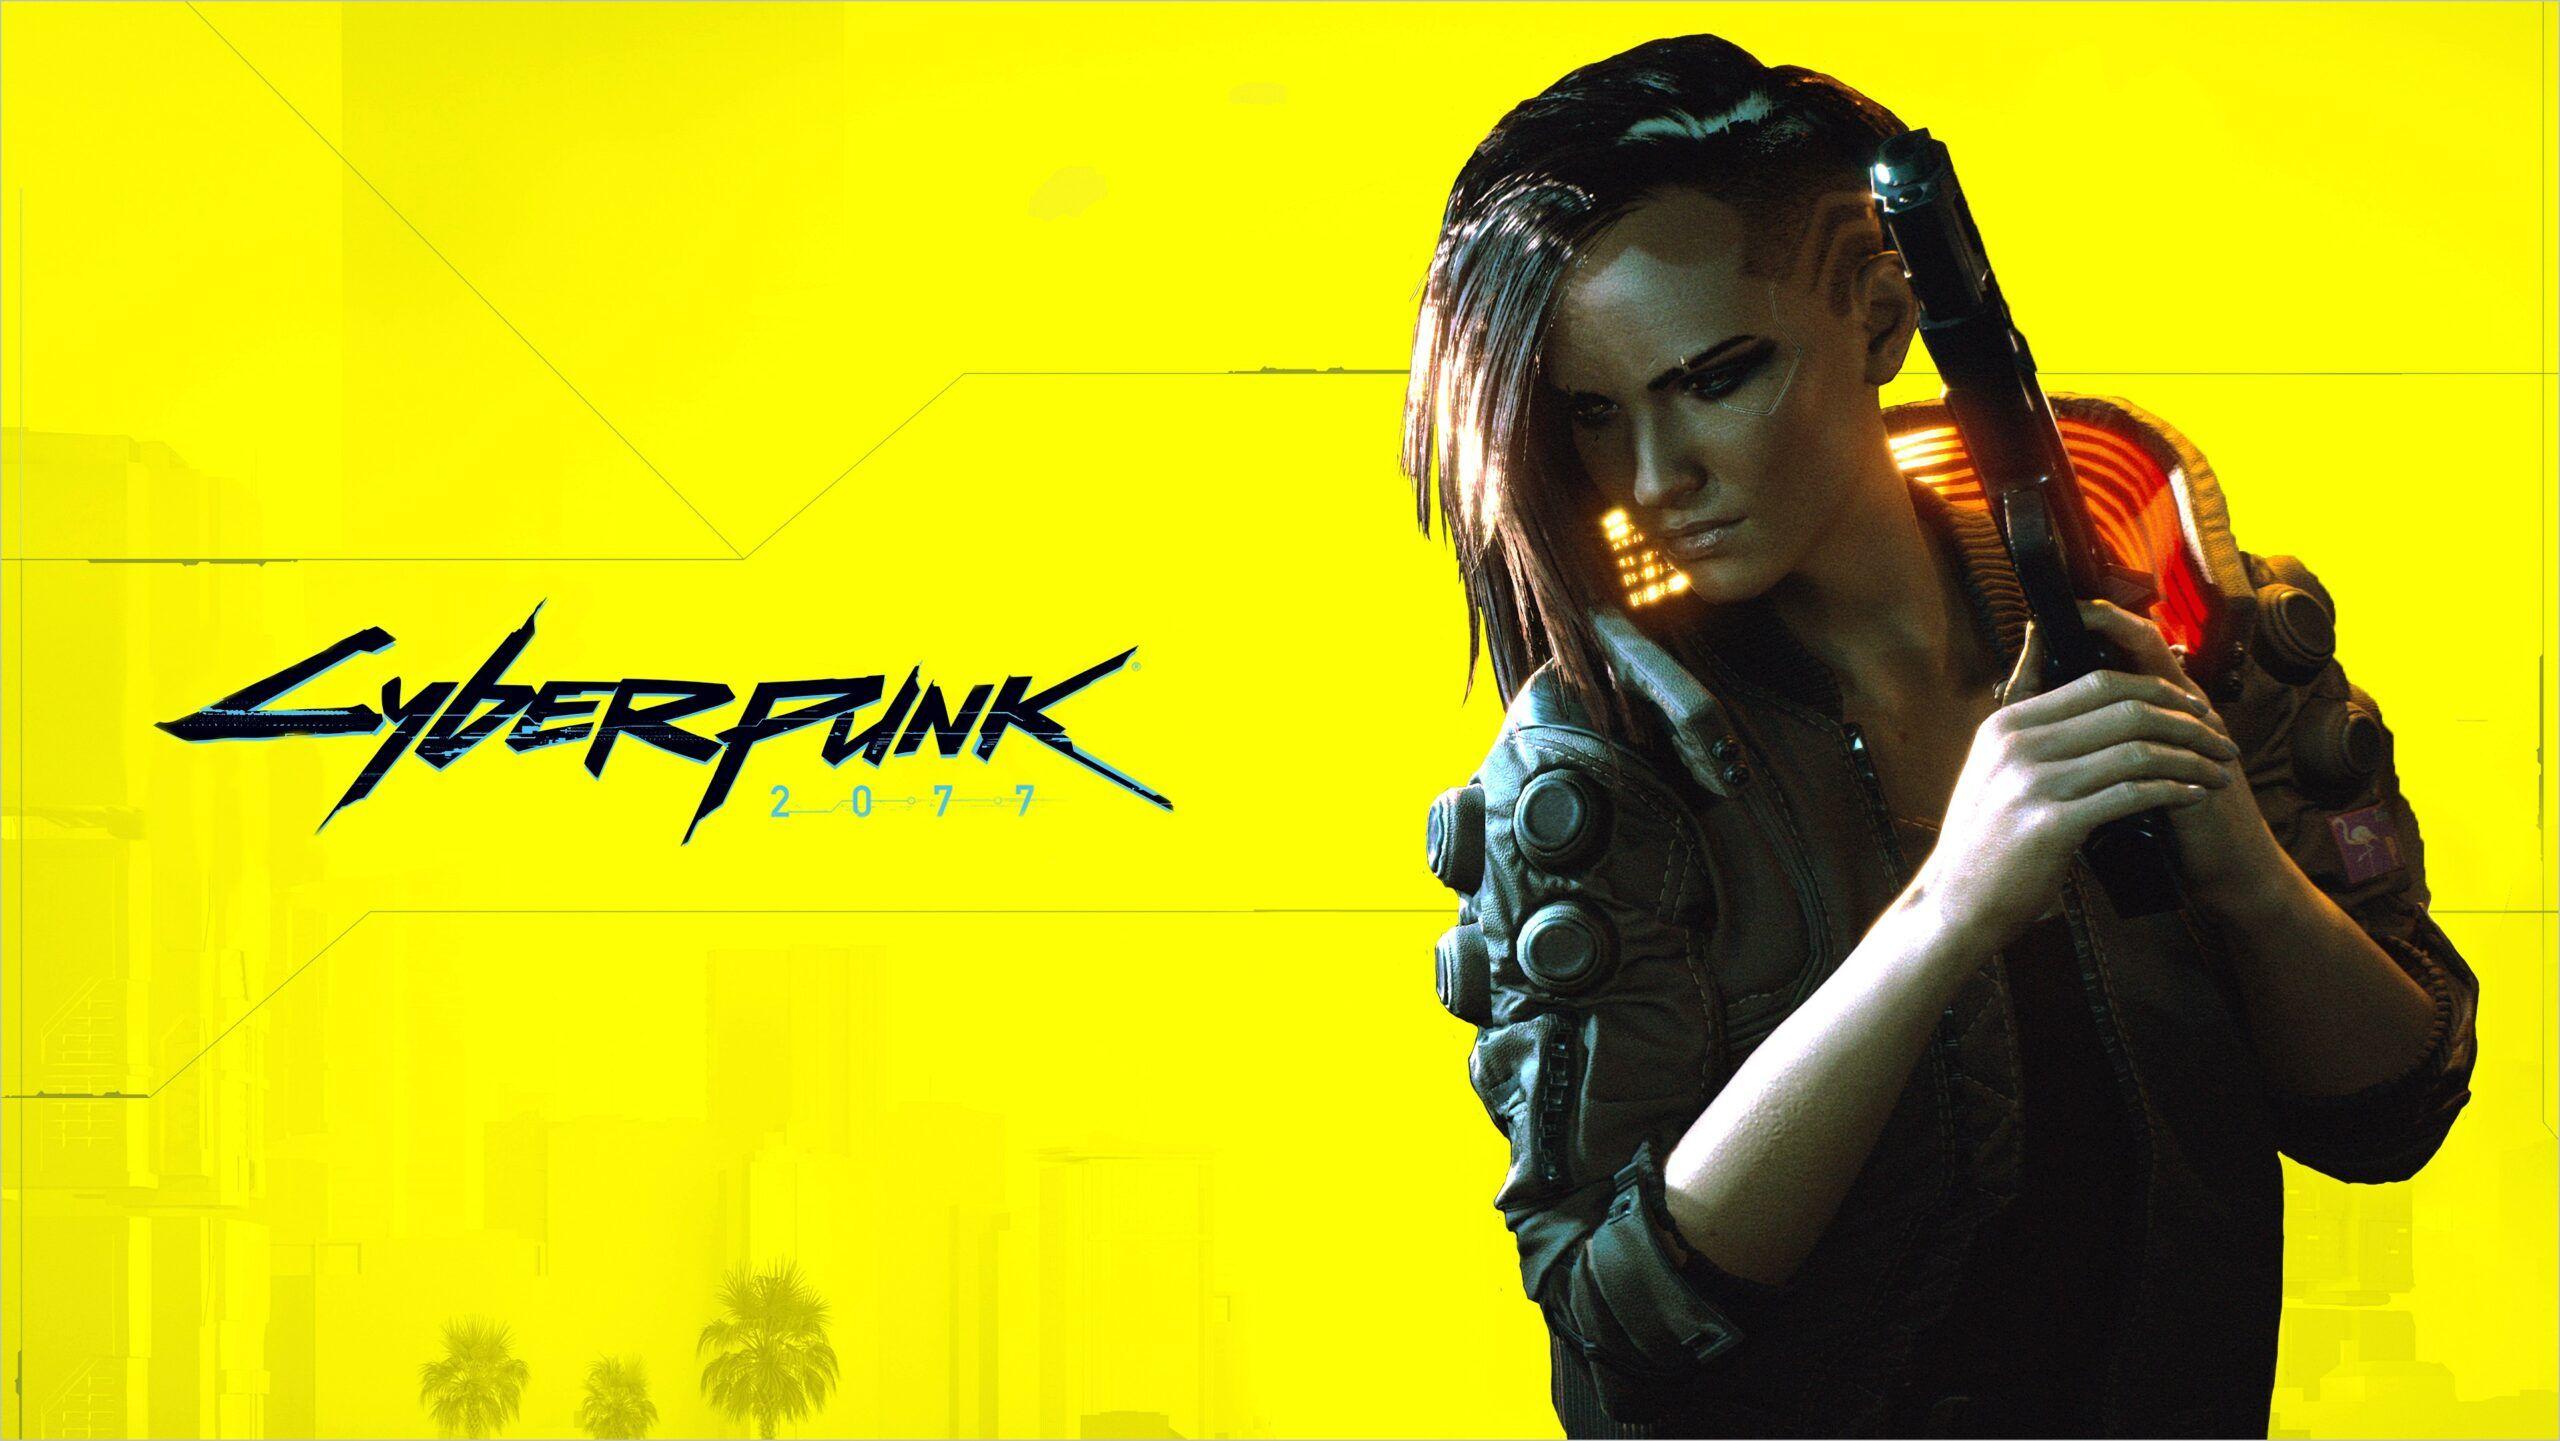 Cyberpunk 2077 4k Wallpaper Yellow In 2020 Cyberpunk 2077 Cyberpunk Wallpaper